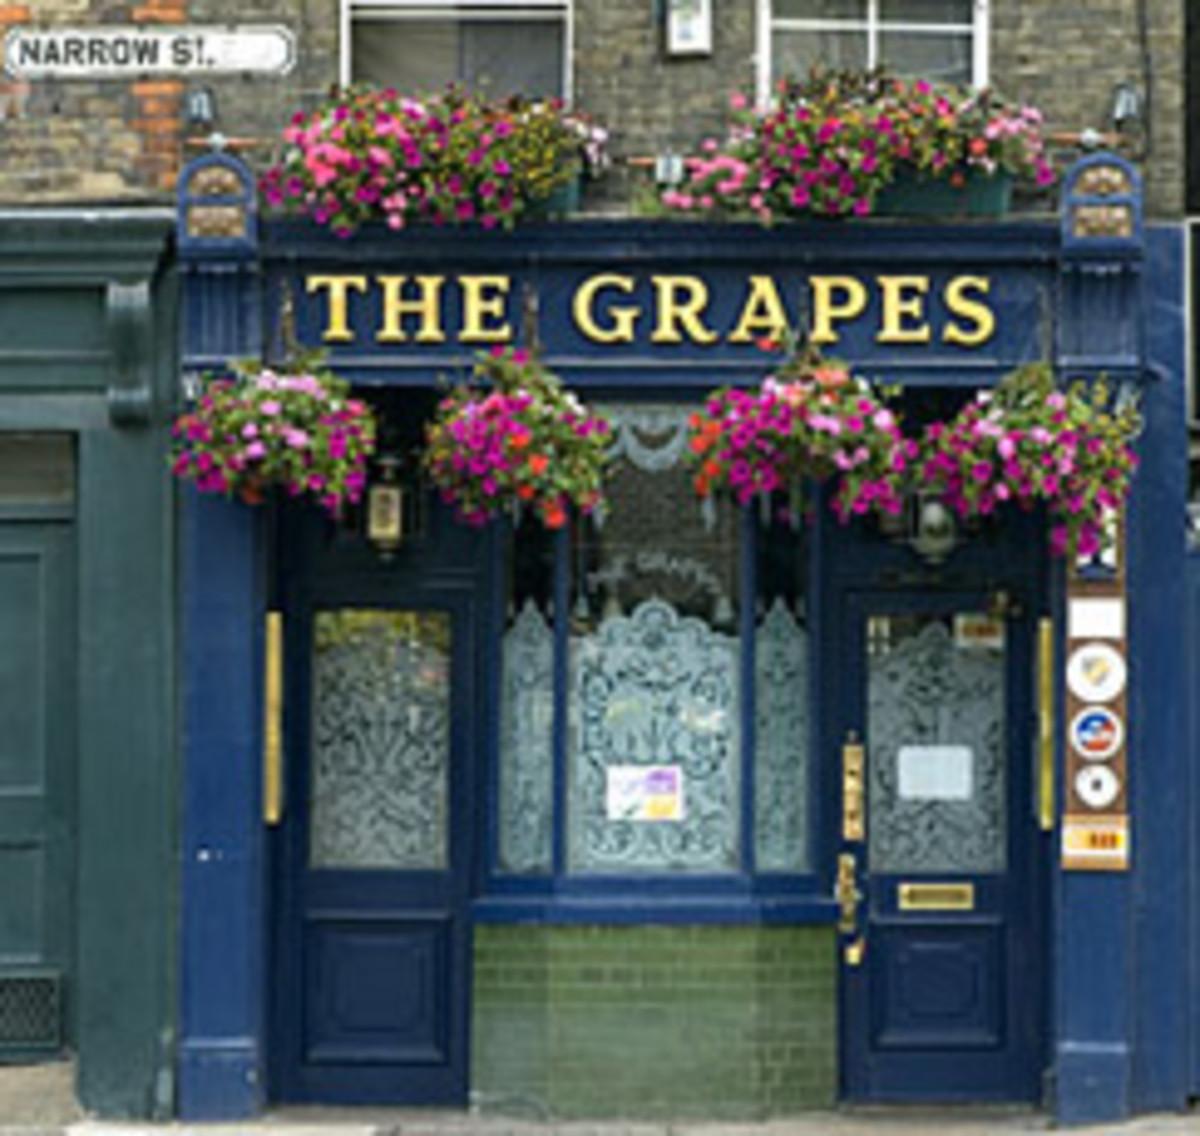 Image from www.thisislondon.co.uk